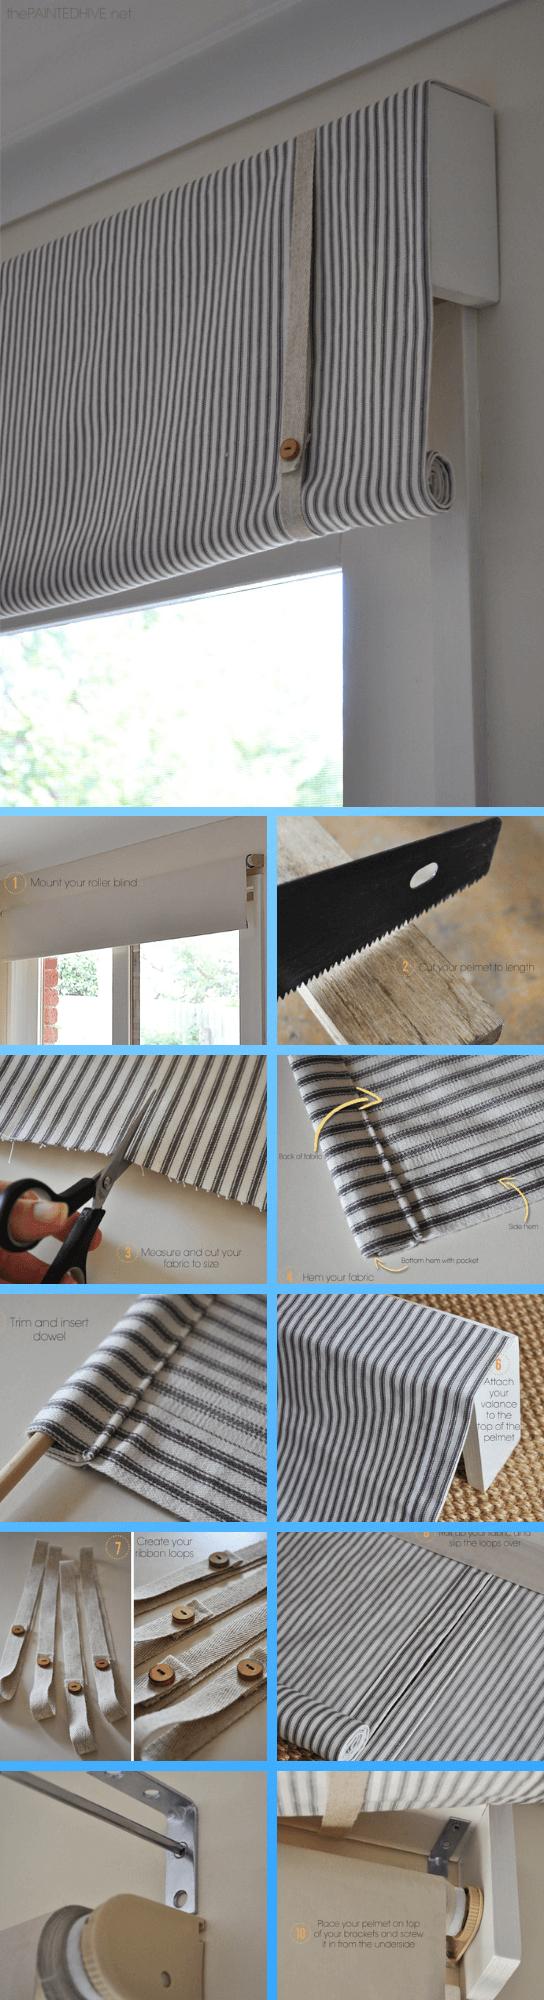 Do It Yourself Window Treatments: 13+ Stunning Farmhouse Window Treatment Projects & Ideas